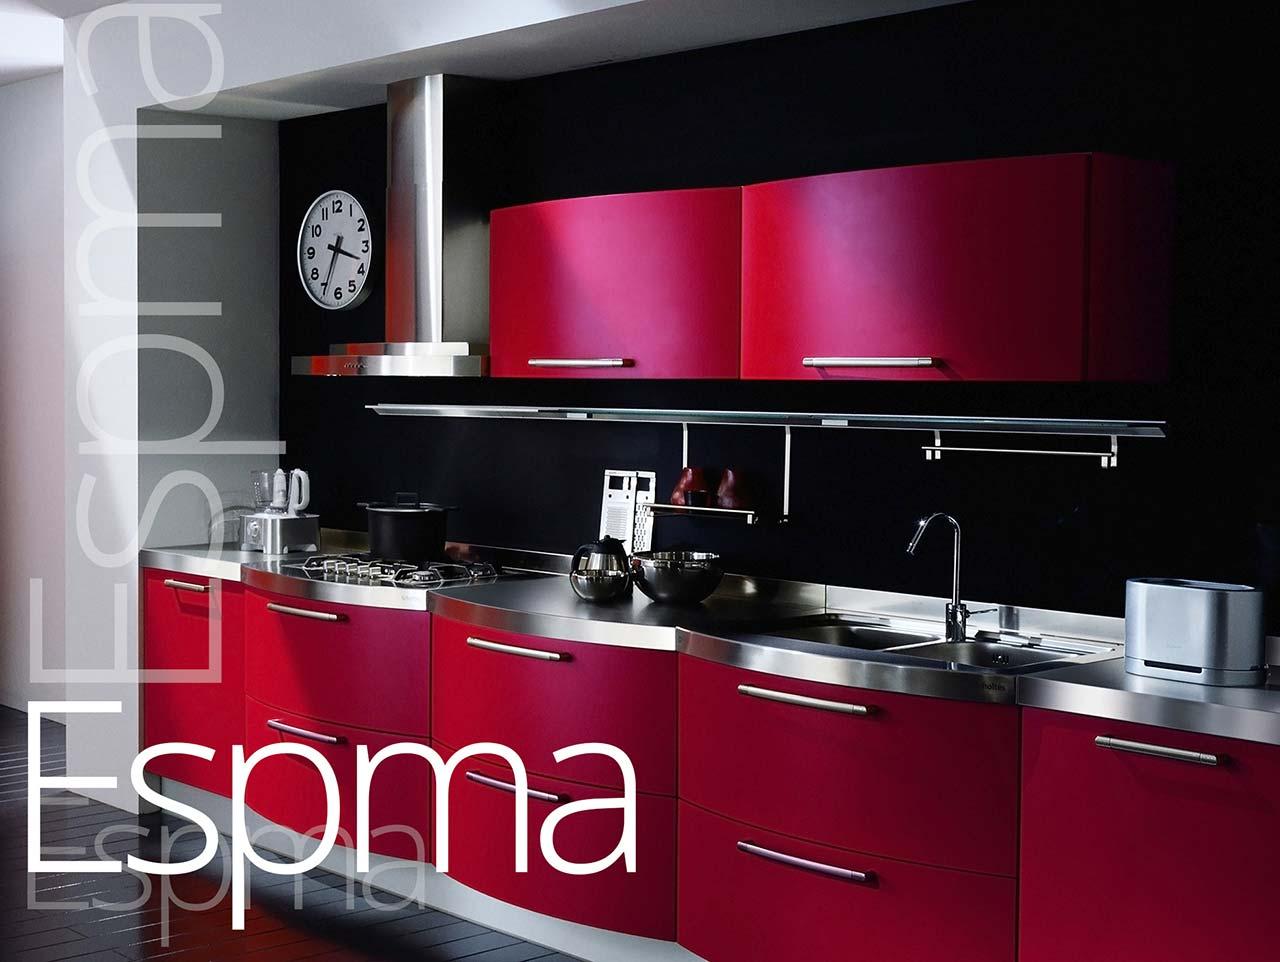 espma-33x25